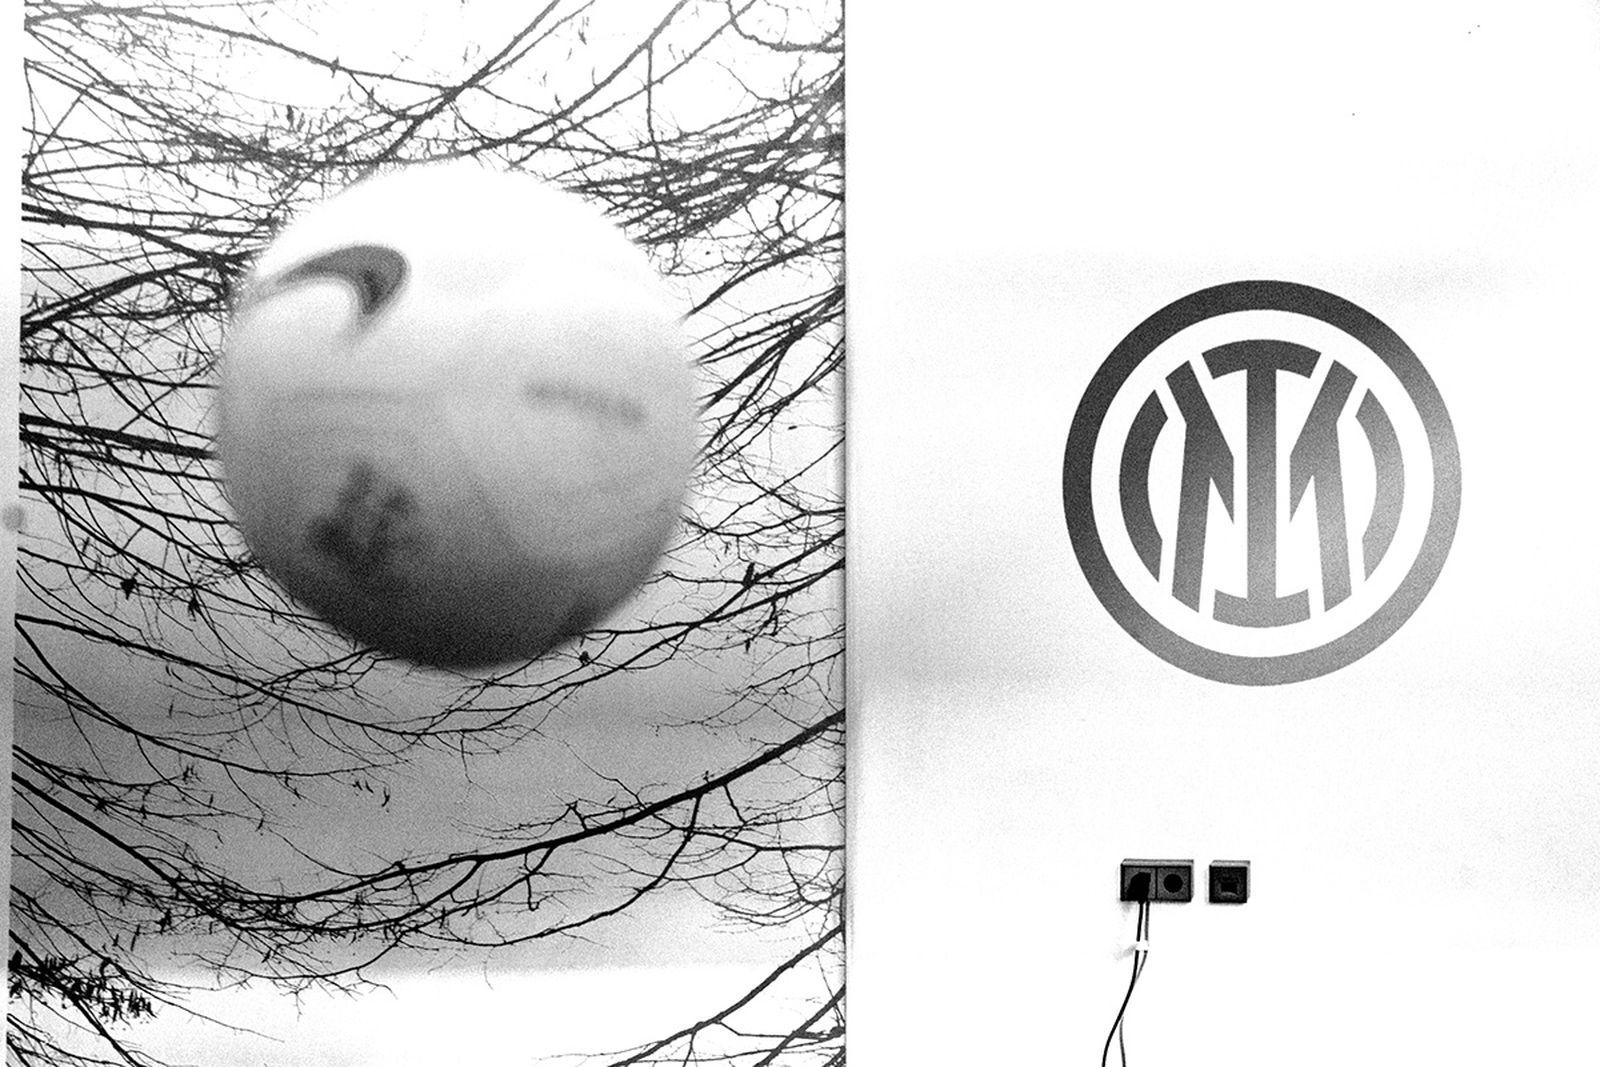 inter-milan-new-logo-bureau-borsche-12